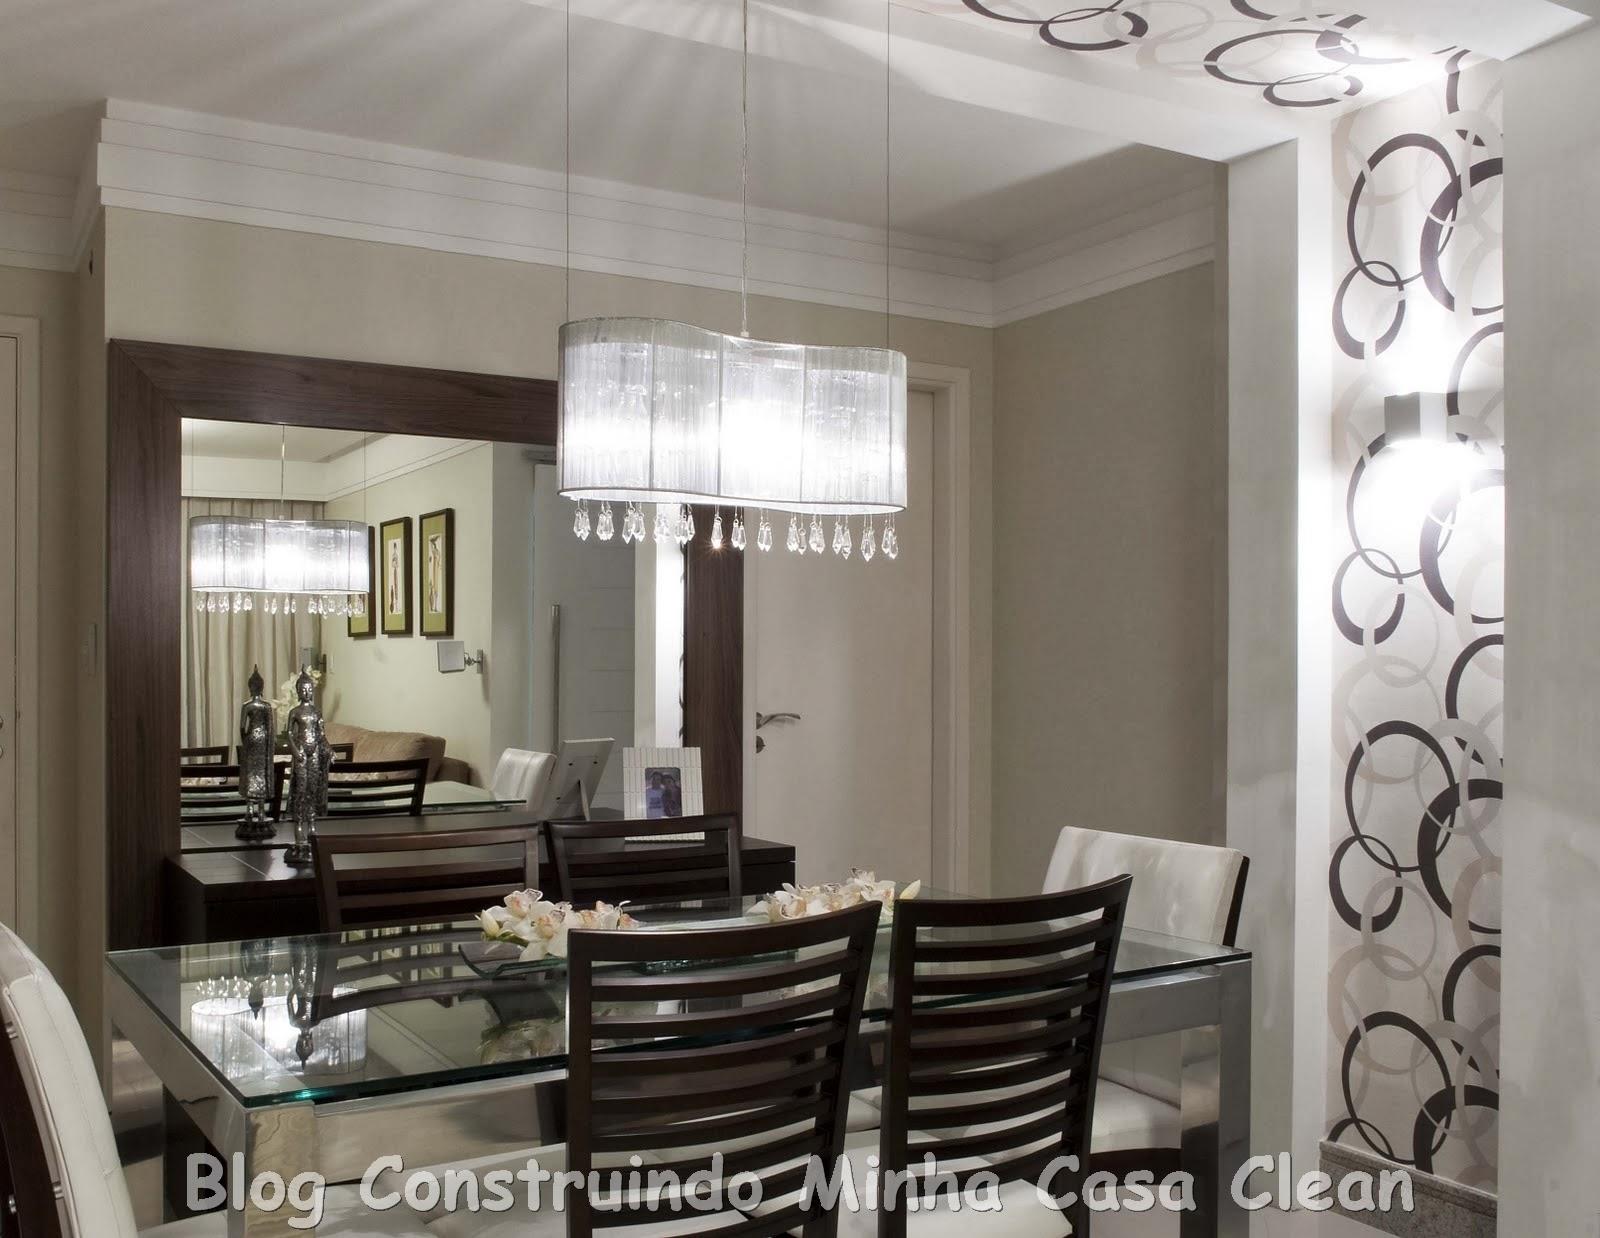 Construindo Minha Casa Clean Como Decorar A Sala De Jantar  -> Sala De Jantar Pequena Com Mesa De Marmore